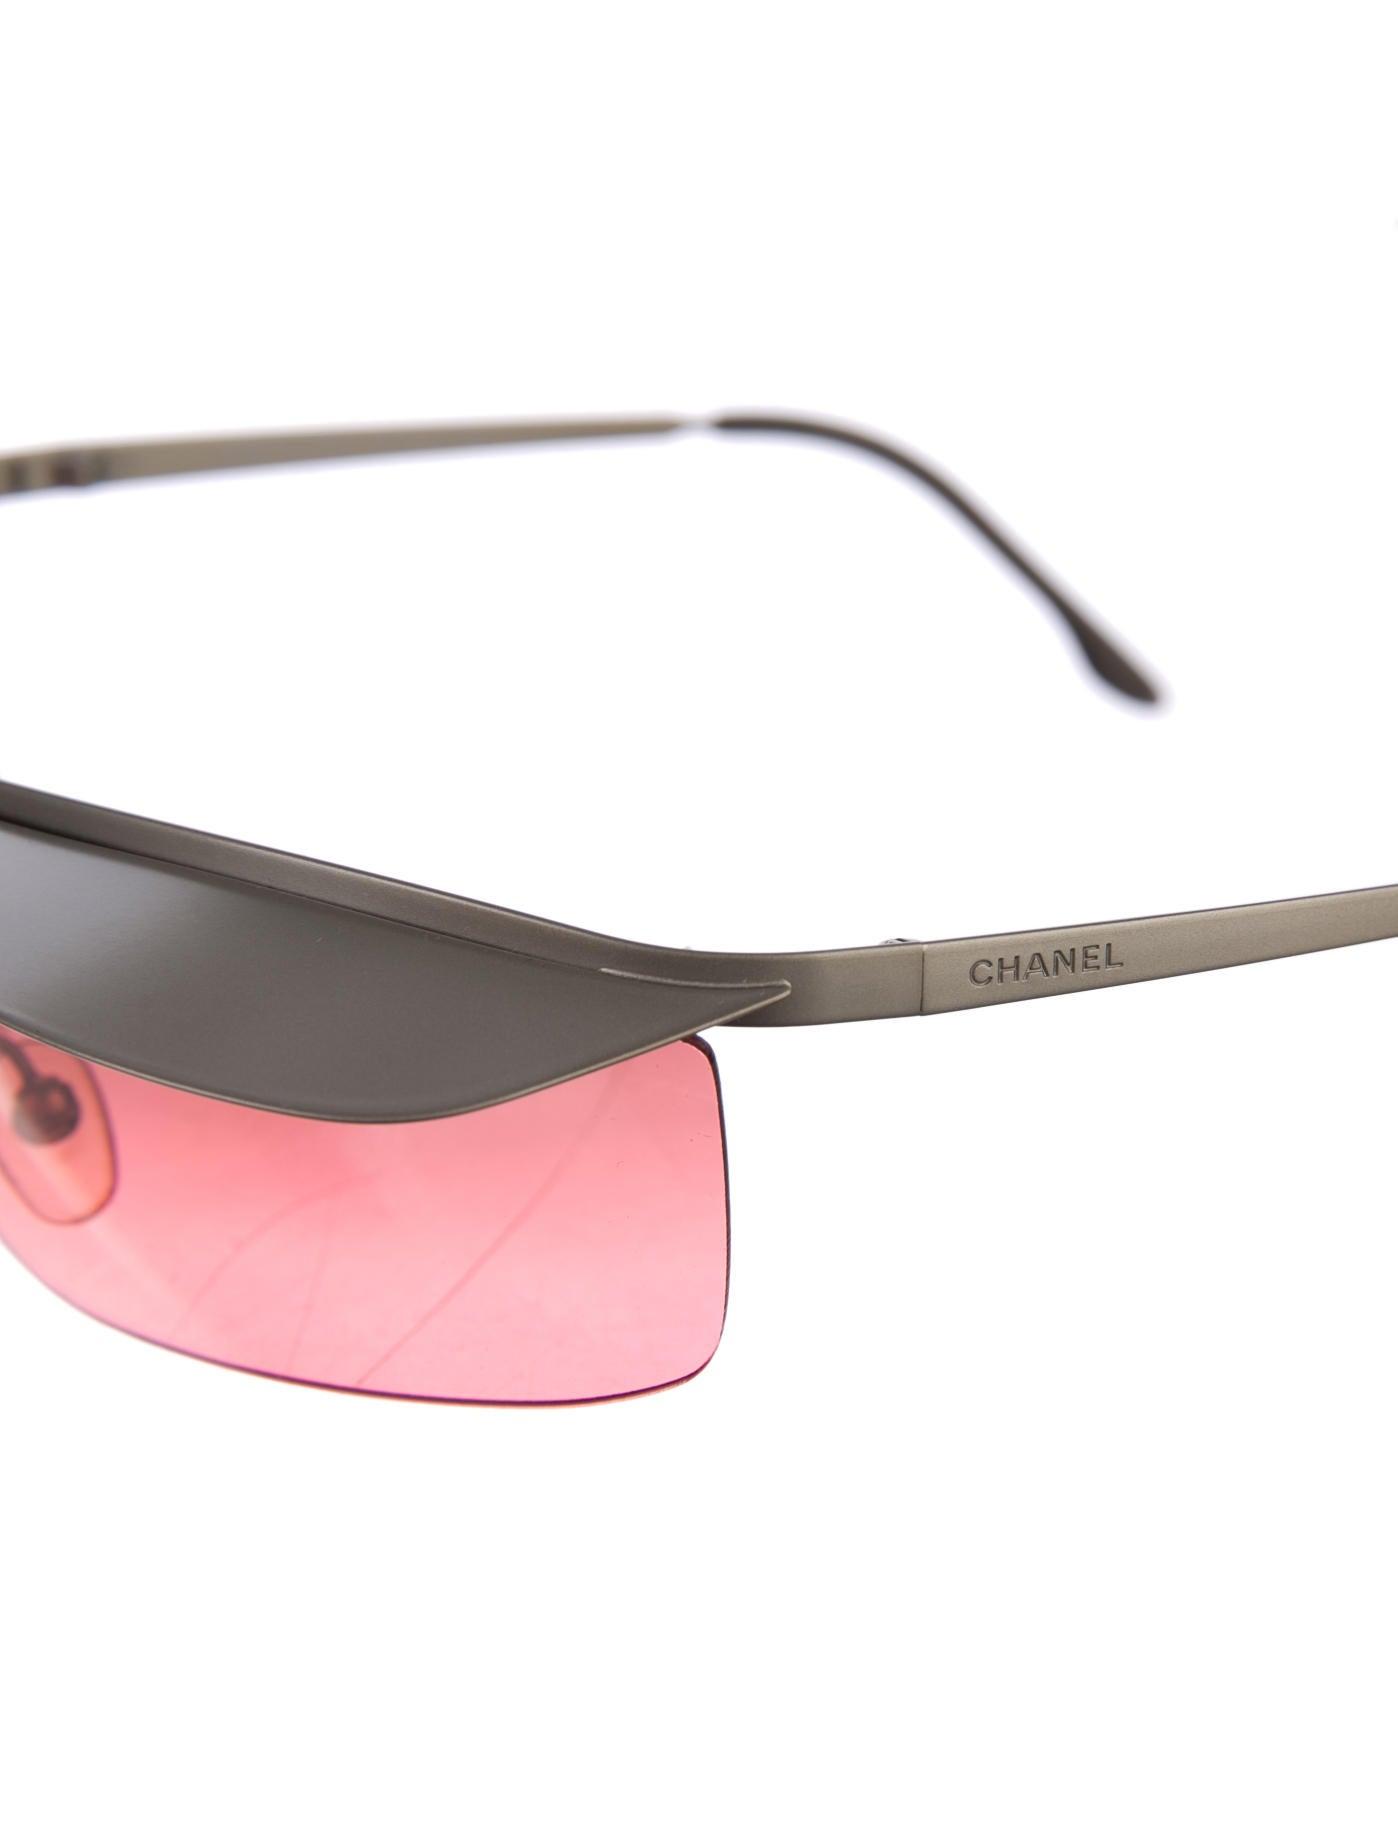 bde25594dc7d Pink Chanel Aviator Sunglasses - Restaurant and Palinka Bar